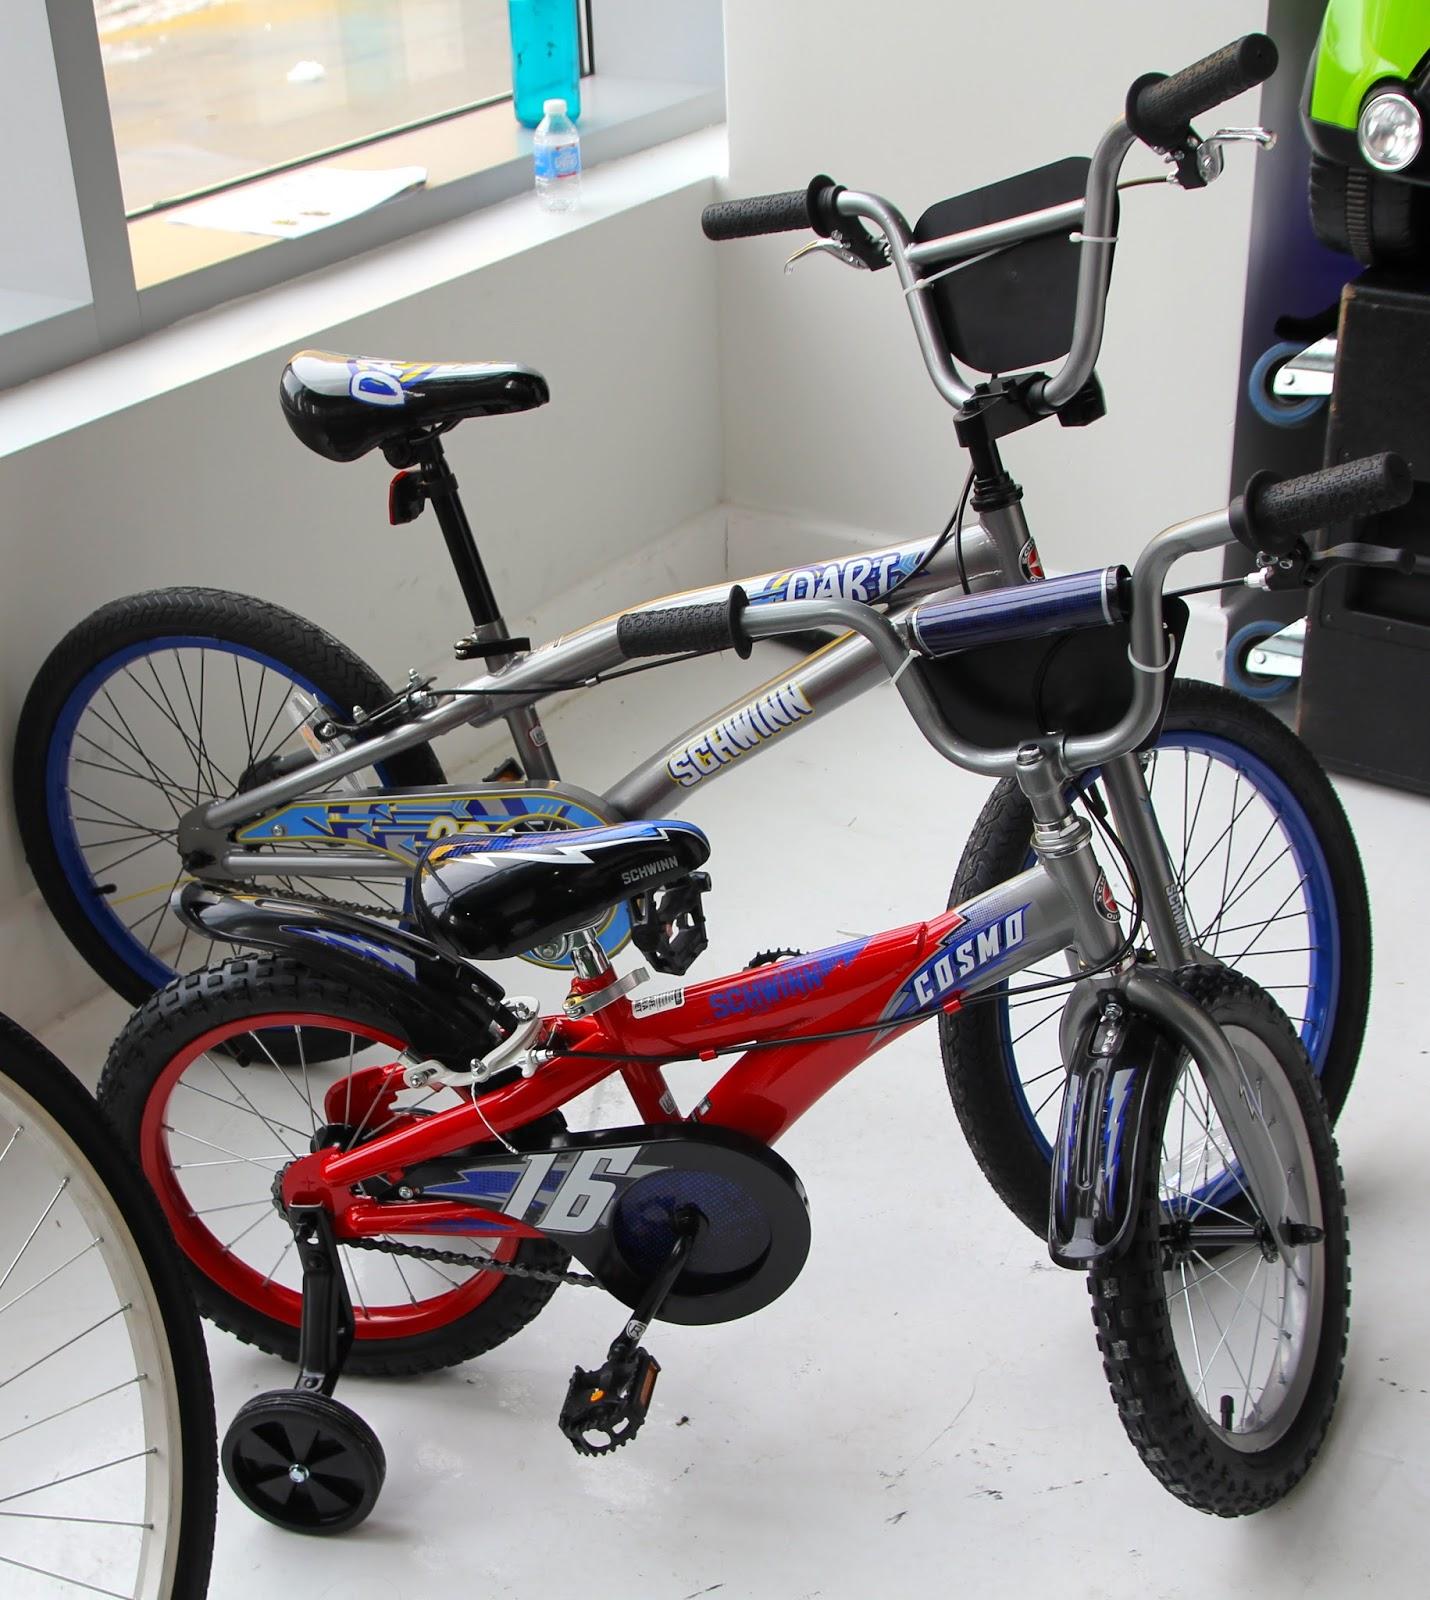 LYRA MAG.: KID TRAX CARS-SCHWINN BIKES - PINT-SIZED/TRICKED OUT RIDES